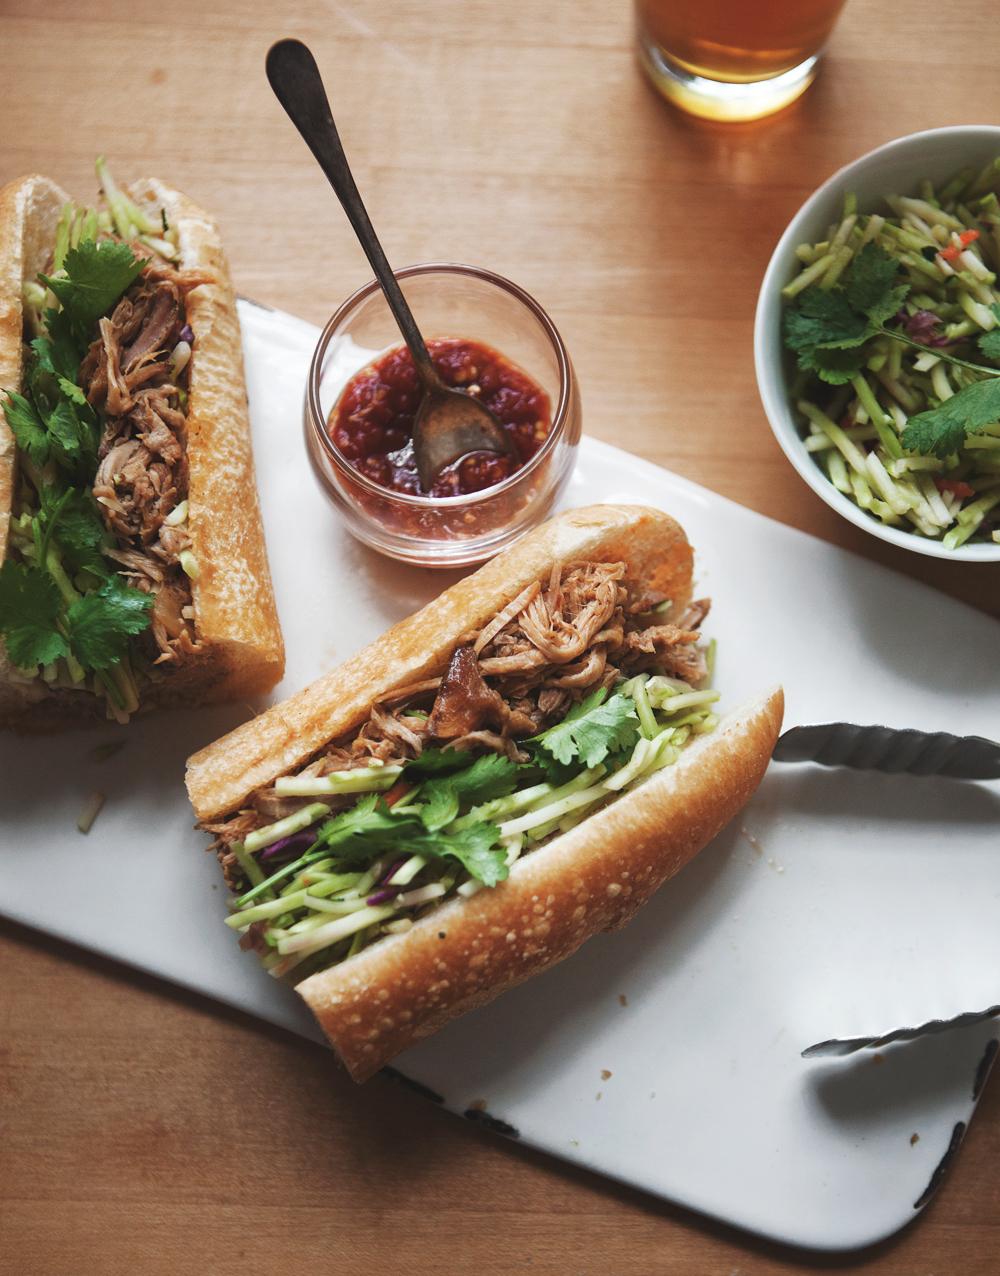 Thai-style-pulled-pork-banh-mi_04.jpg